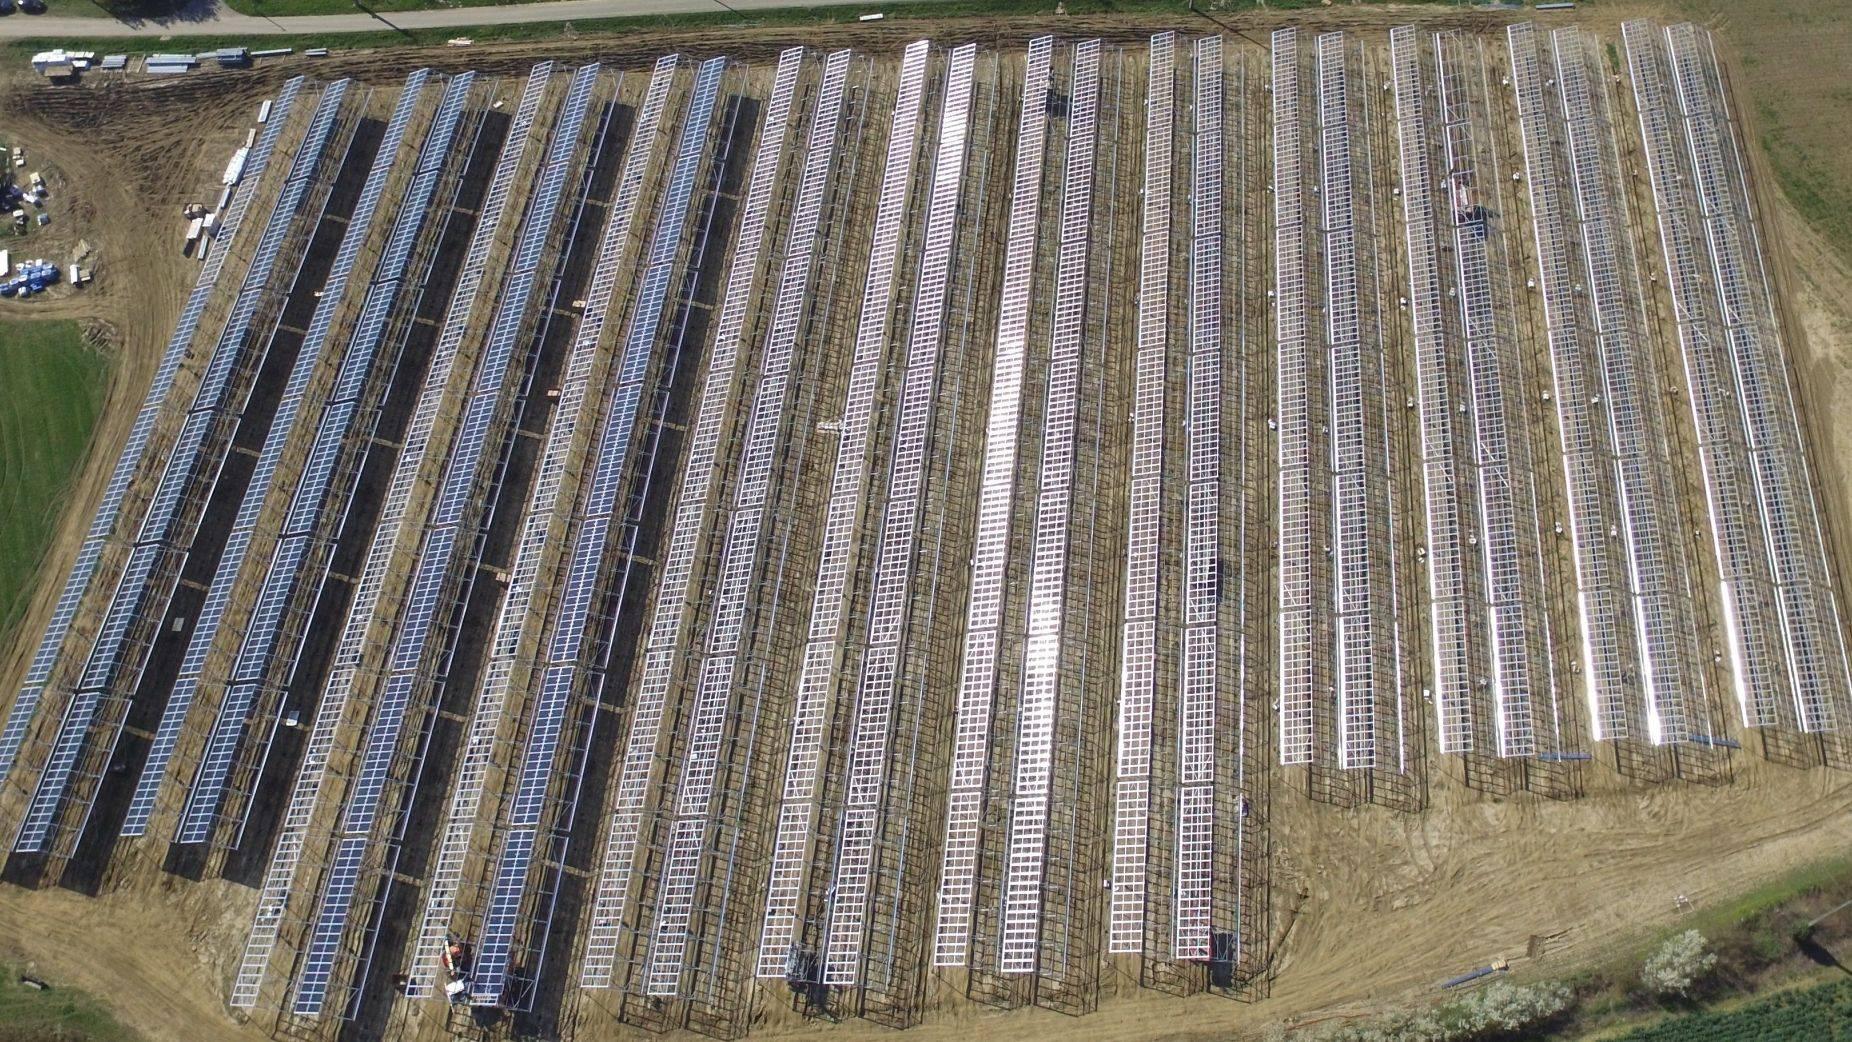 Serre agricole - TARN ET GARONNE - Mecoworks